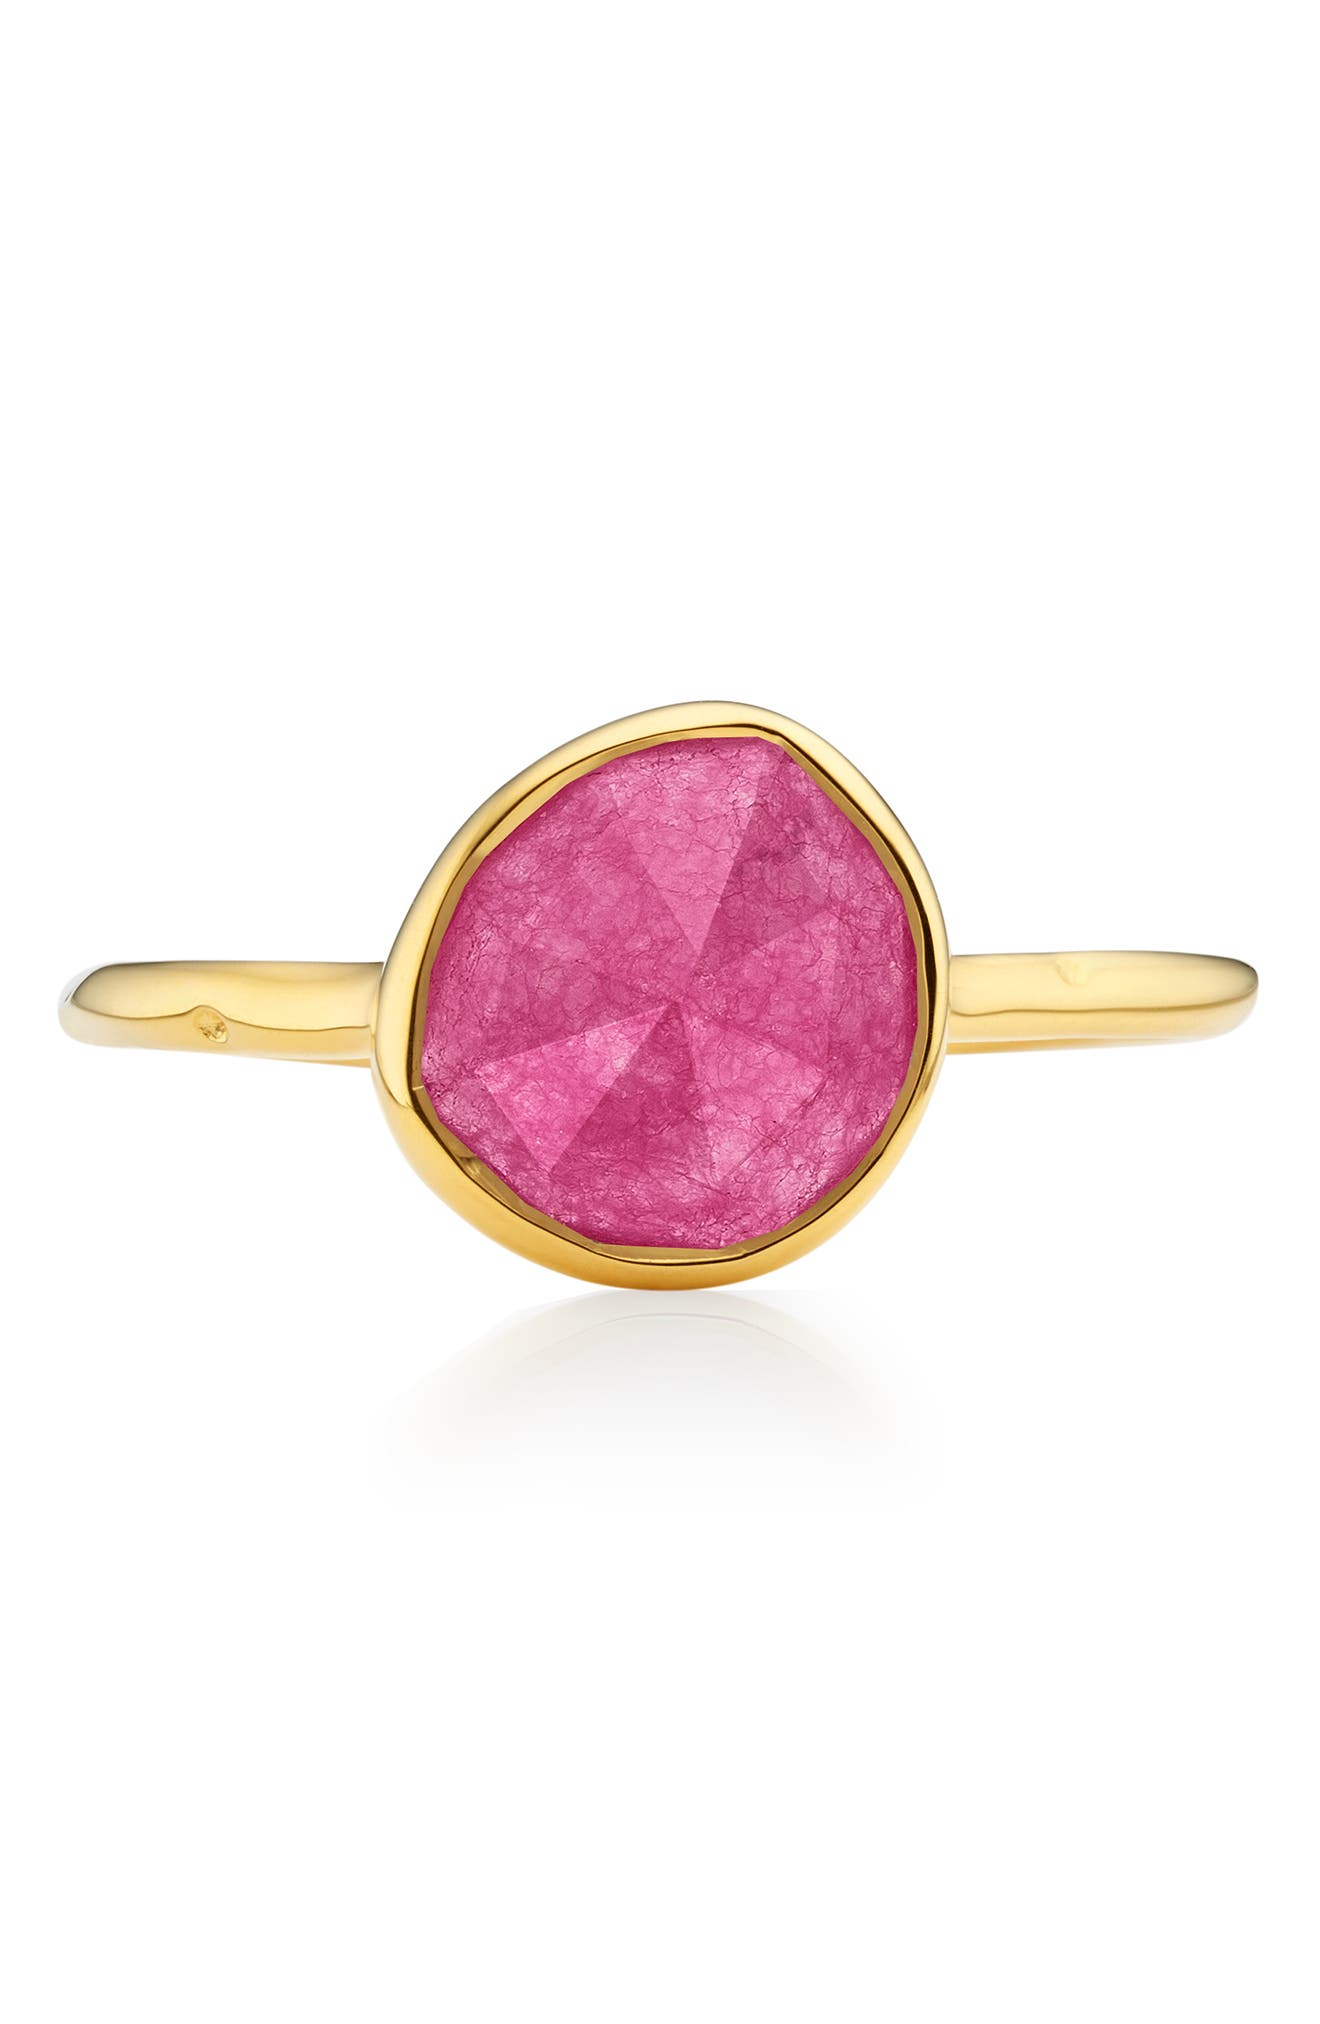 MONICA VINADER, Siren Semiprecious Stone Stacking Ring, Alternate thumbnail 4, color, GOLD/ PINK QUARTZ